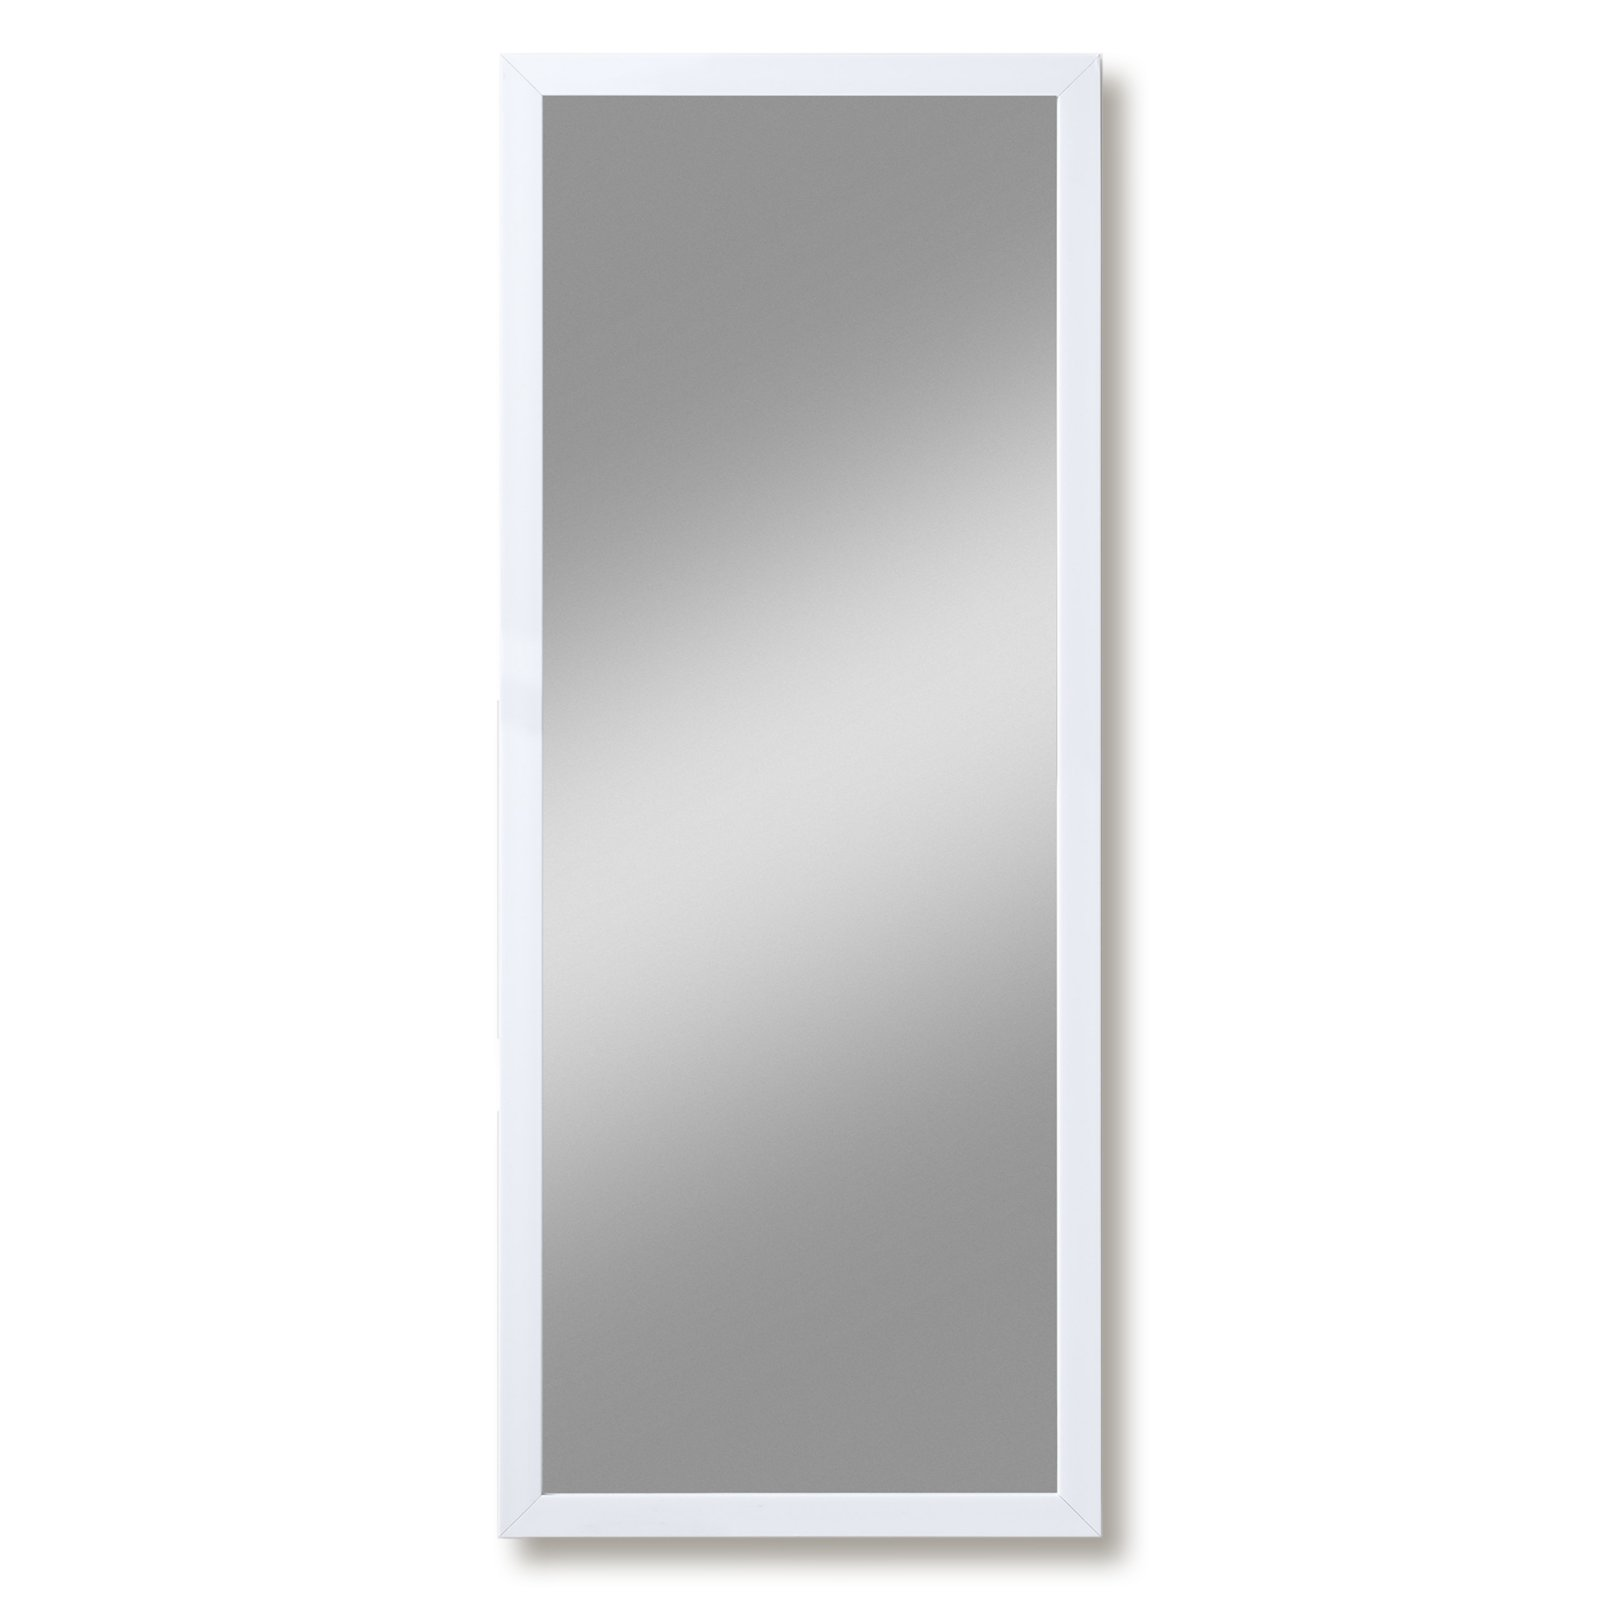 spiegel beach wei gl nzend 40x100 cm wandspiegel spiegel deko haushalt m belhaus. Black Bedroom Furniture Sets. Home Design Ideas